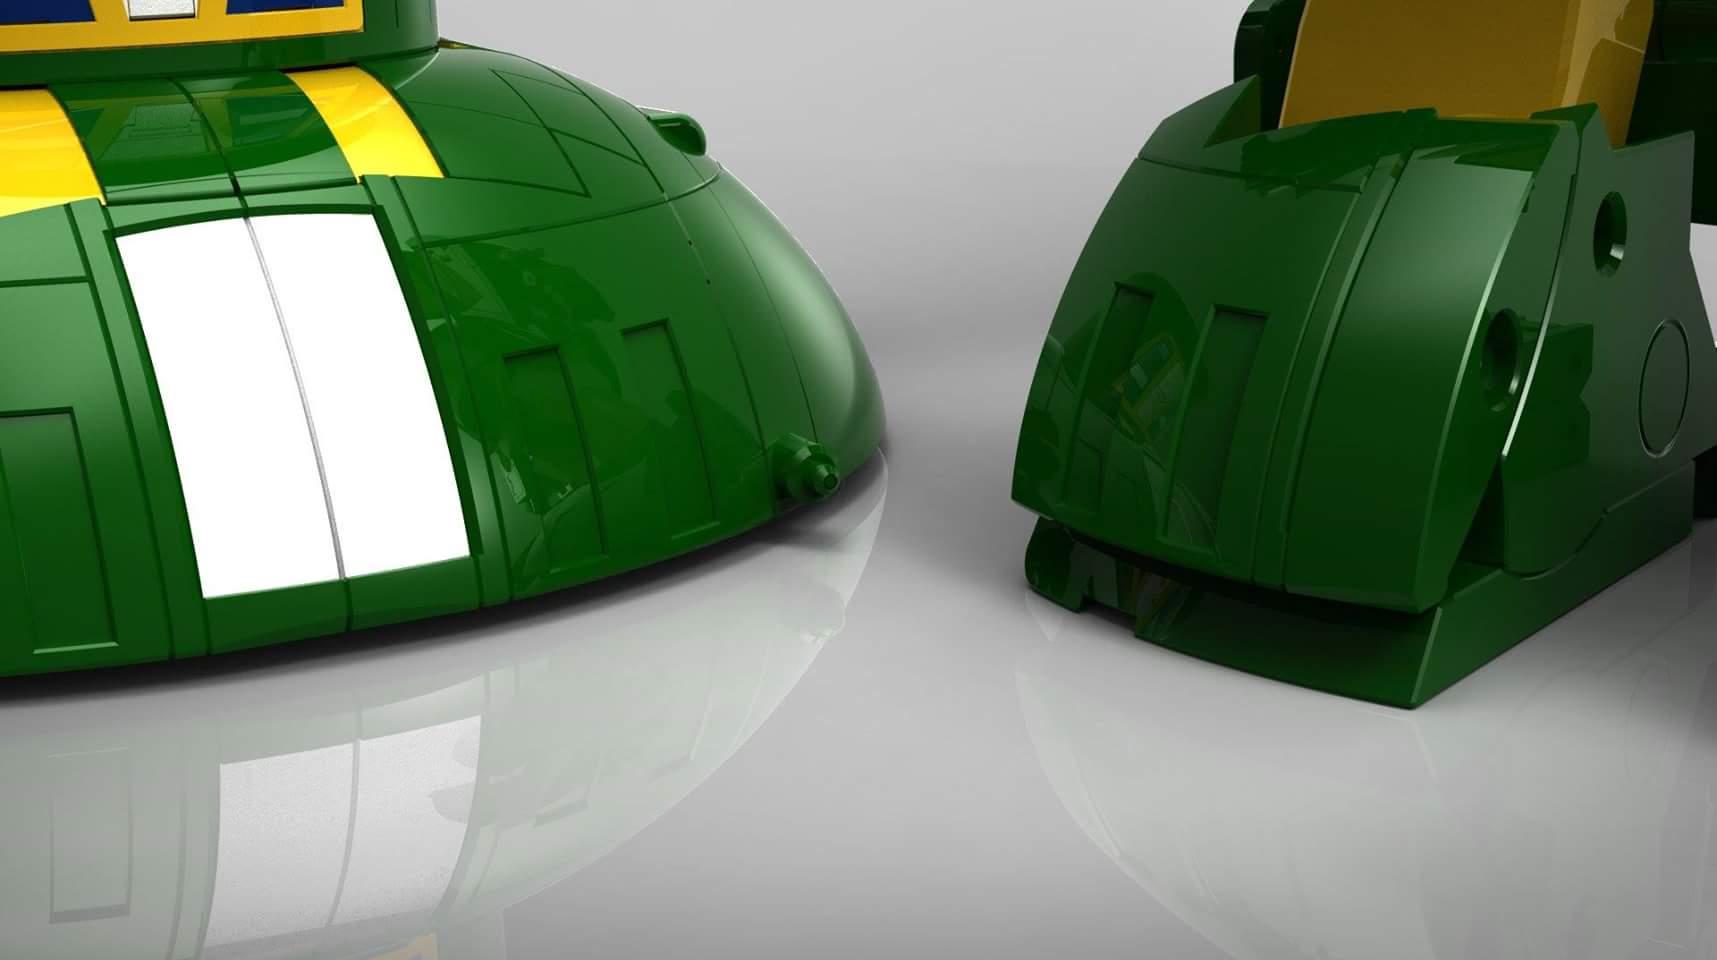 [X-Transbots] Produit Tiers - Minibots MP - Gamme MM - Page 10 5XhoBjos